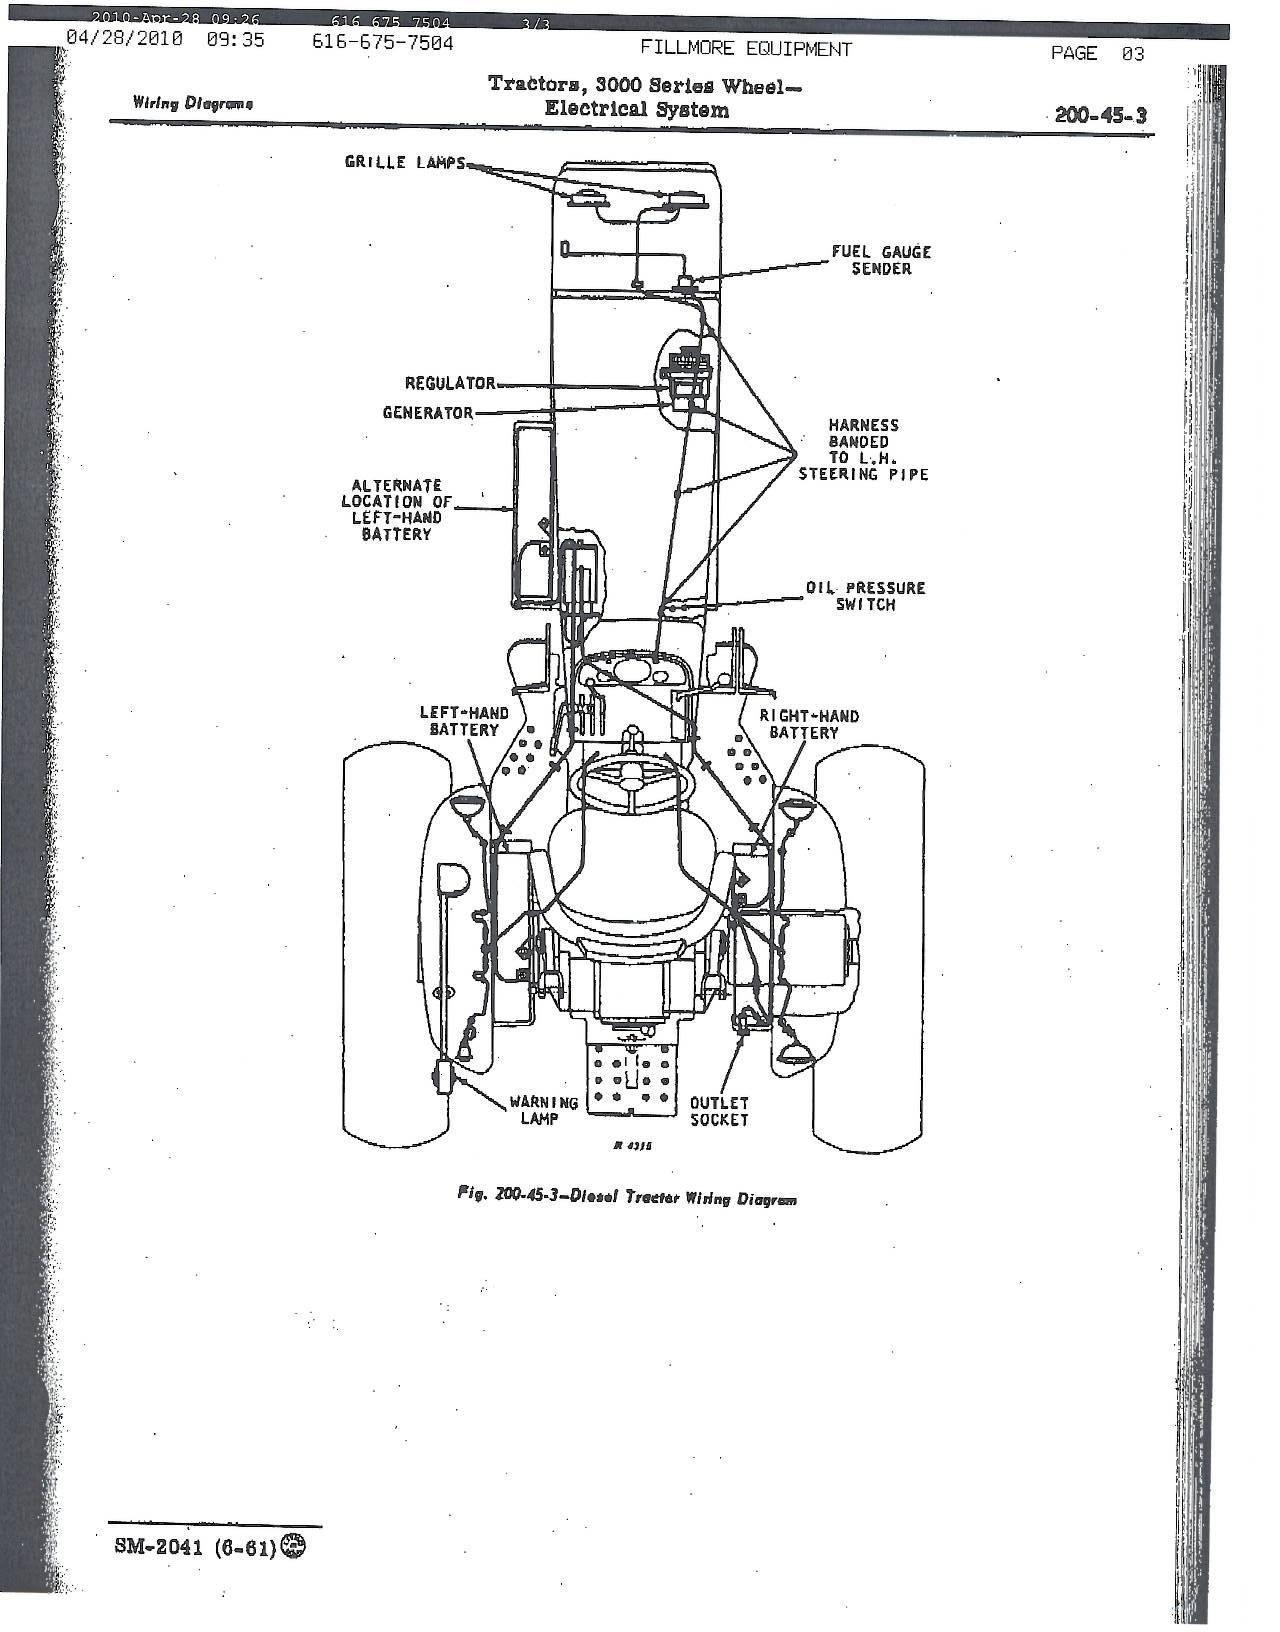 hight resolution of john deere gator 6x4 gas wiring diagram john deere gator engine parts diagram awesome john